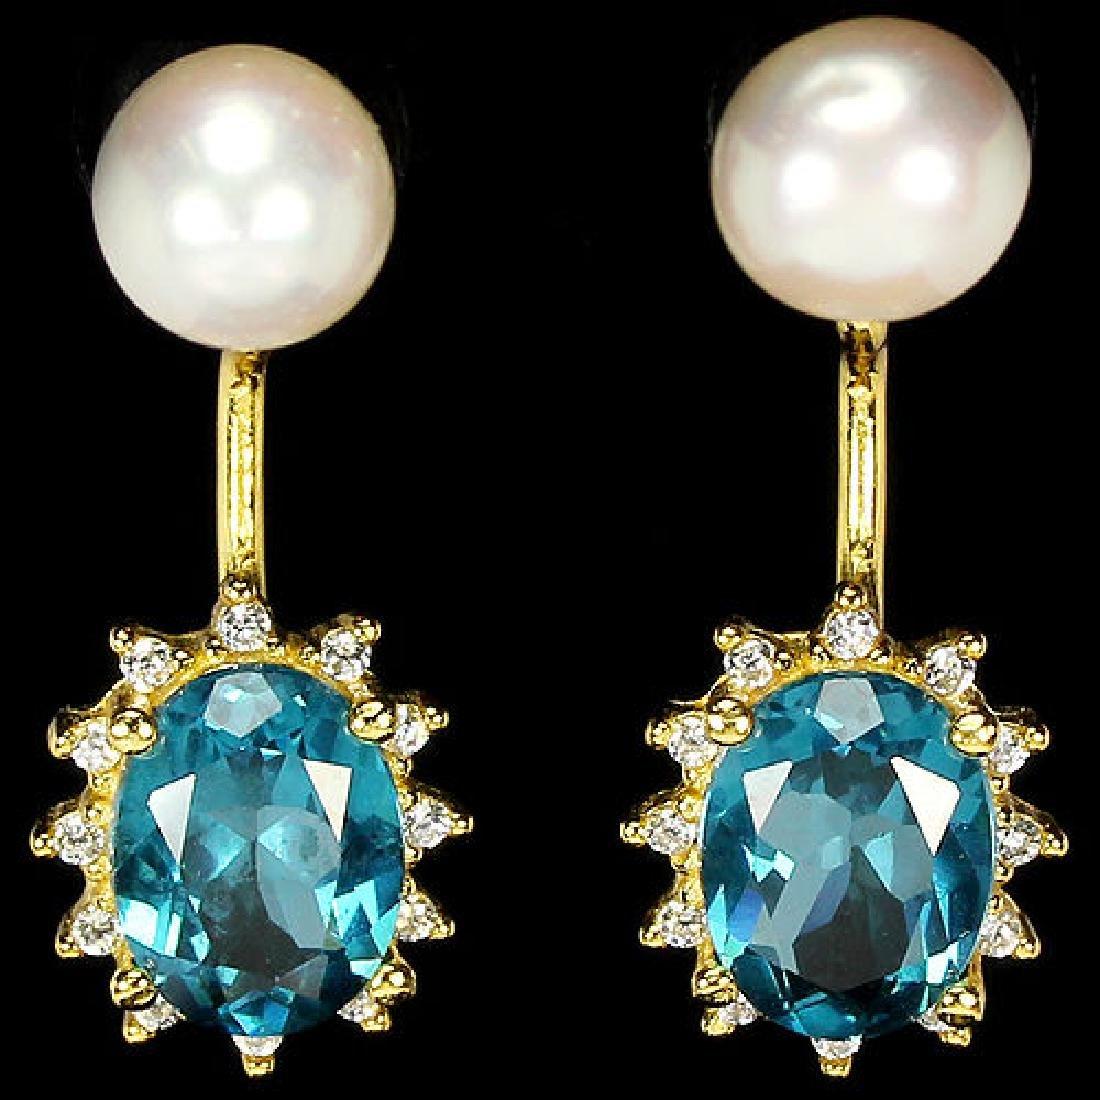 Natural London Blue Topaz & Pearl Earrings